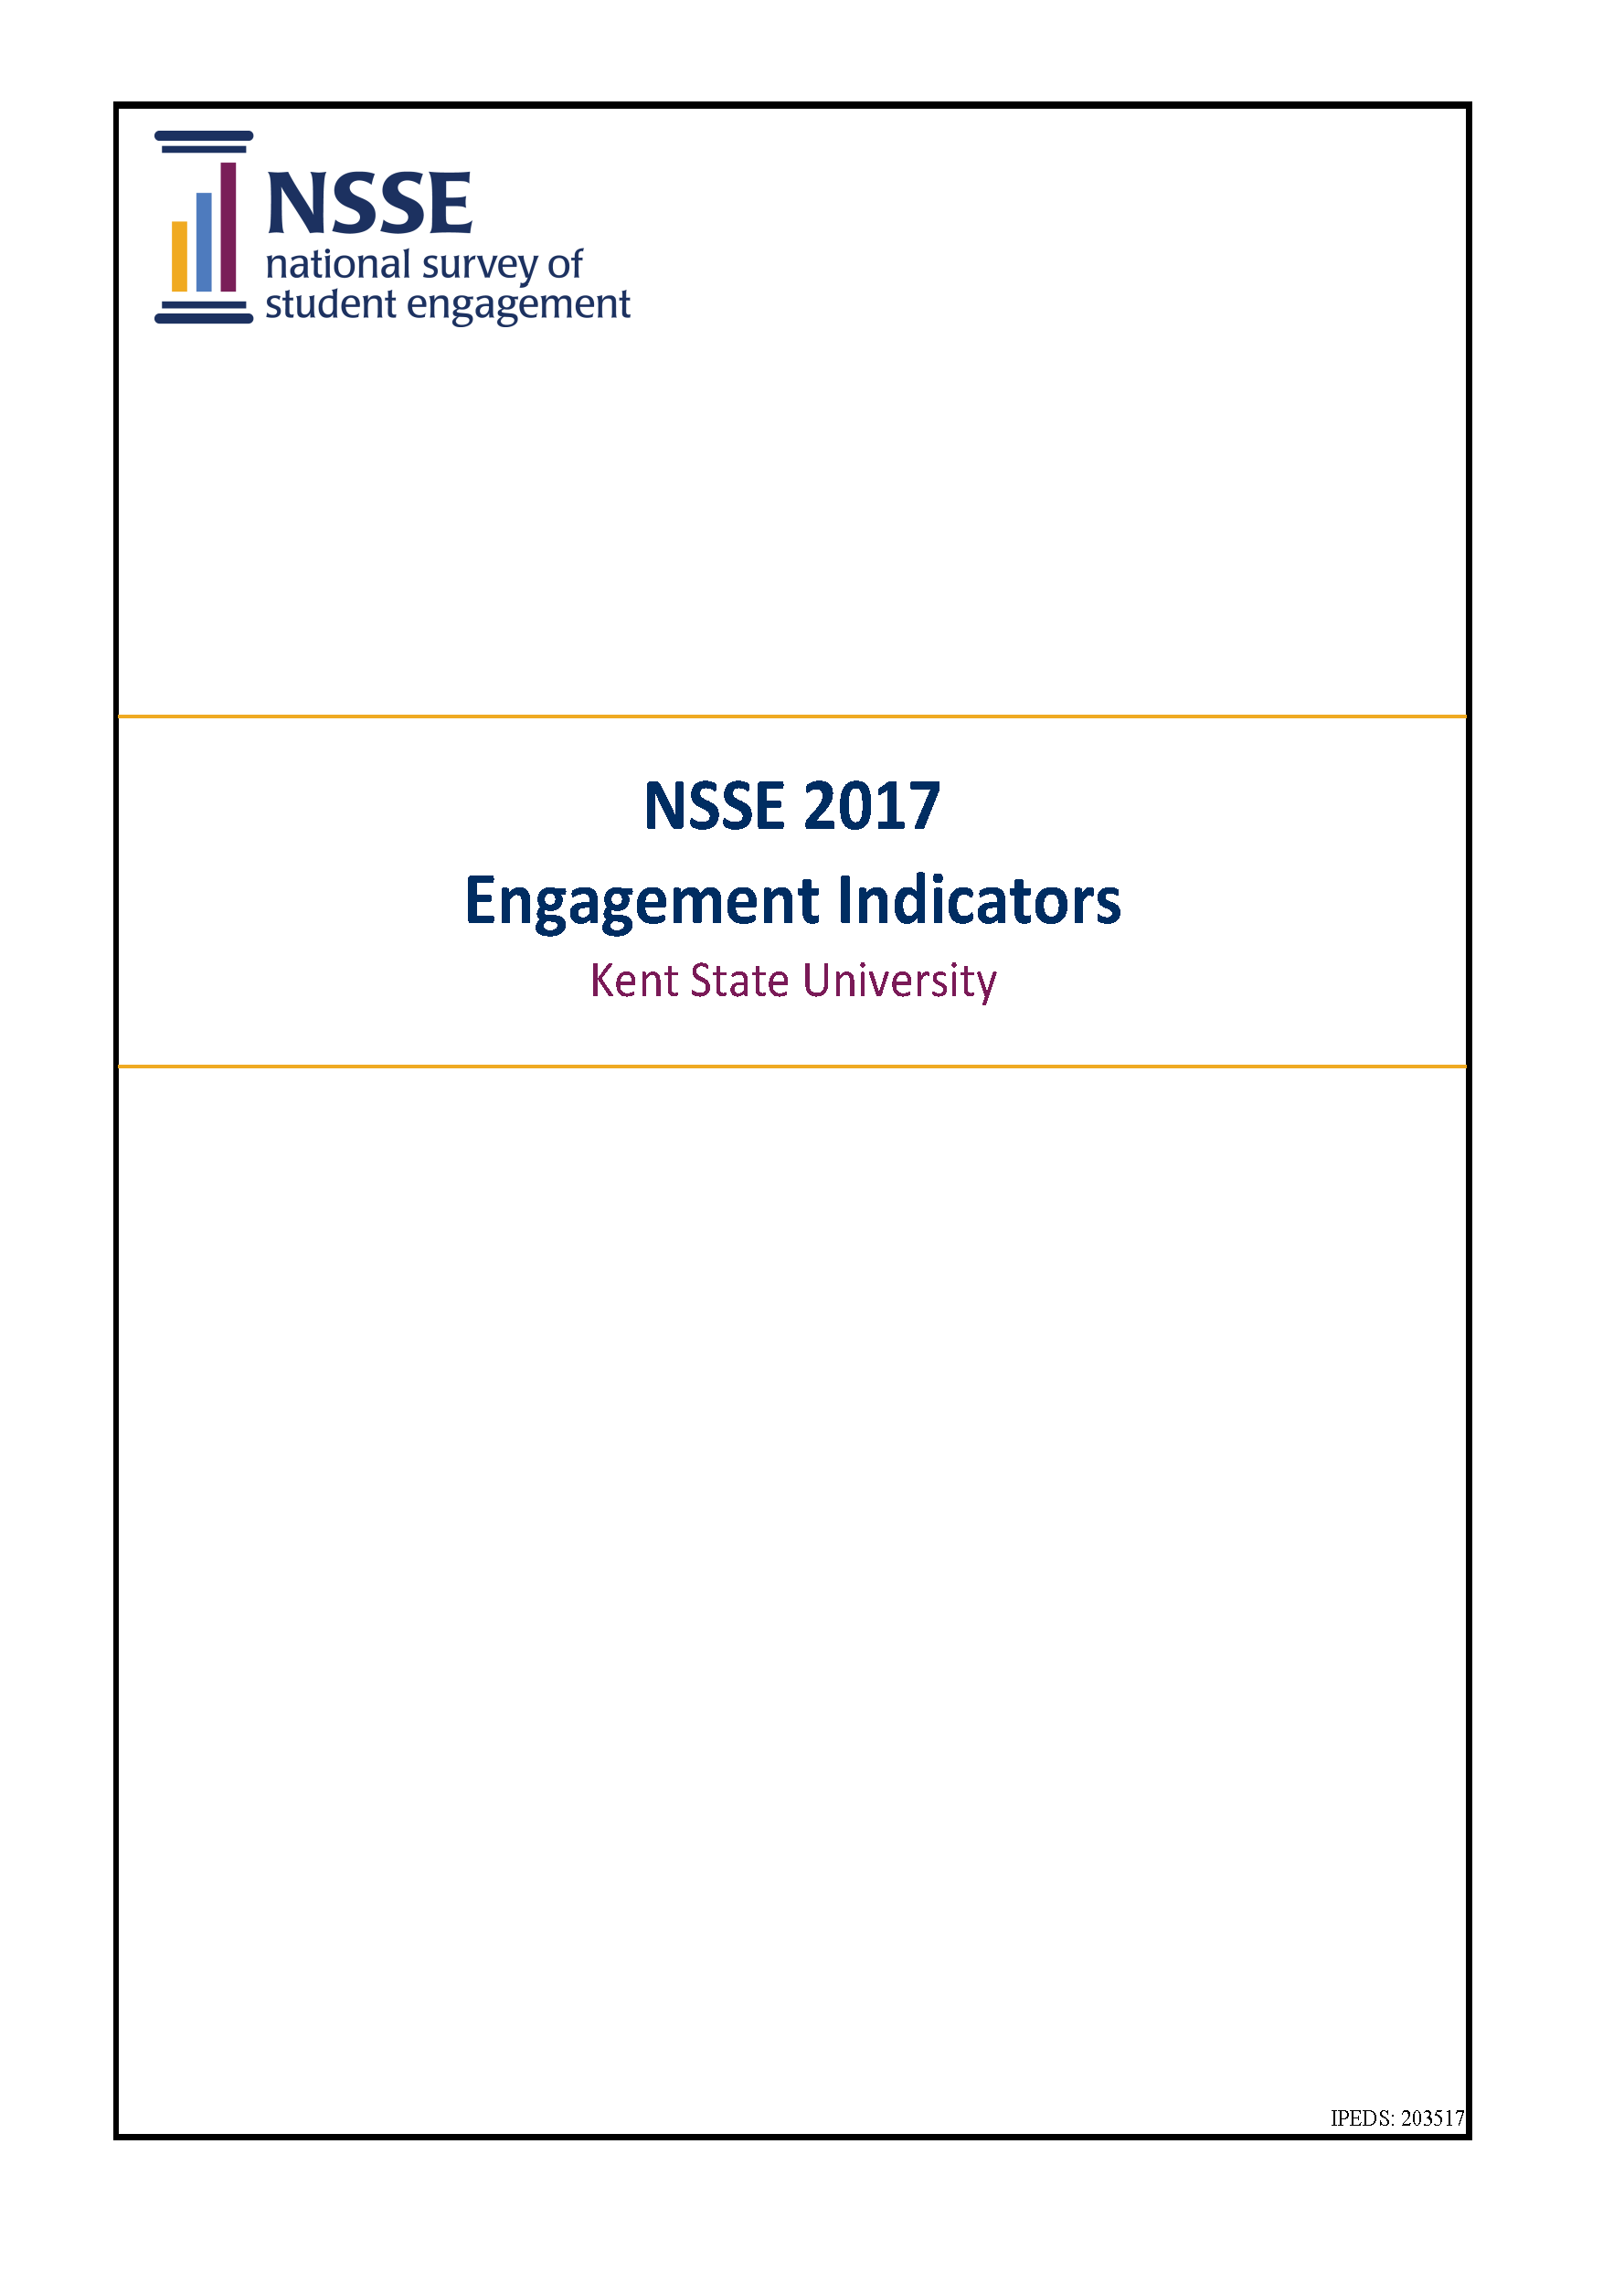 2017 NSSE Engagement Indicators Results